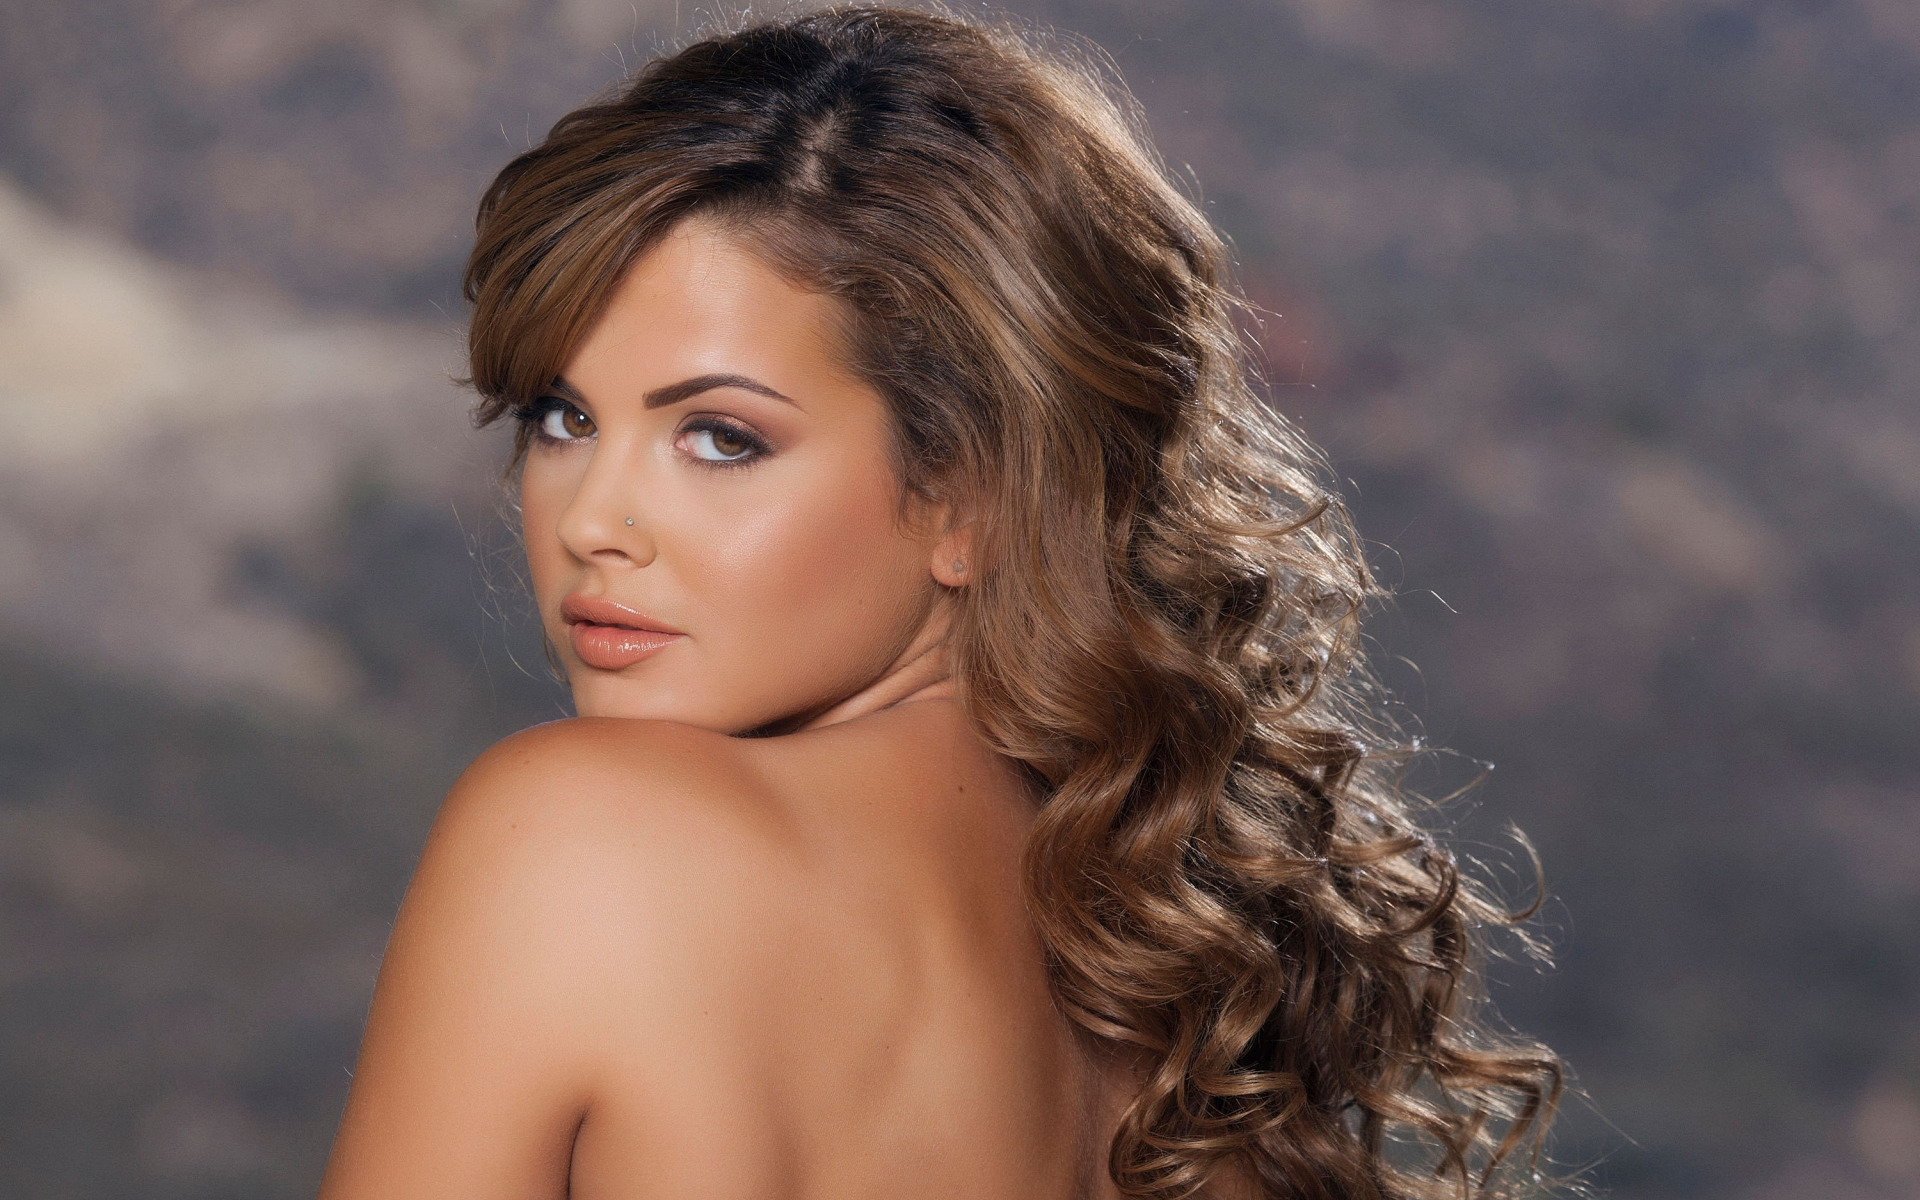 Hair sexy model gif